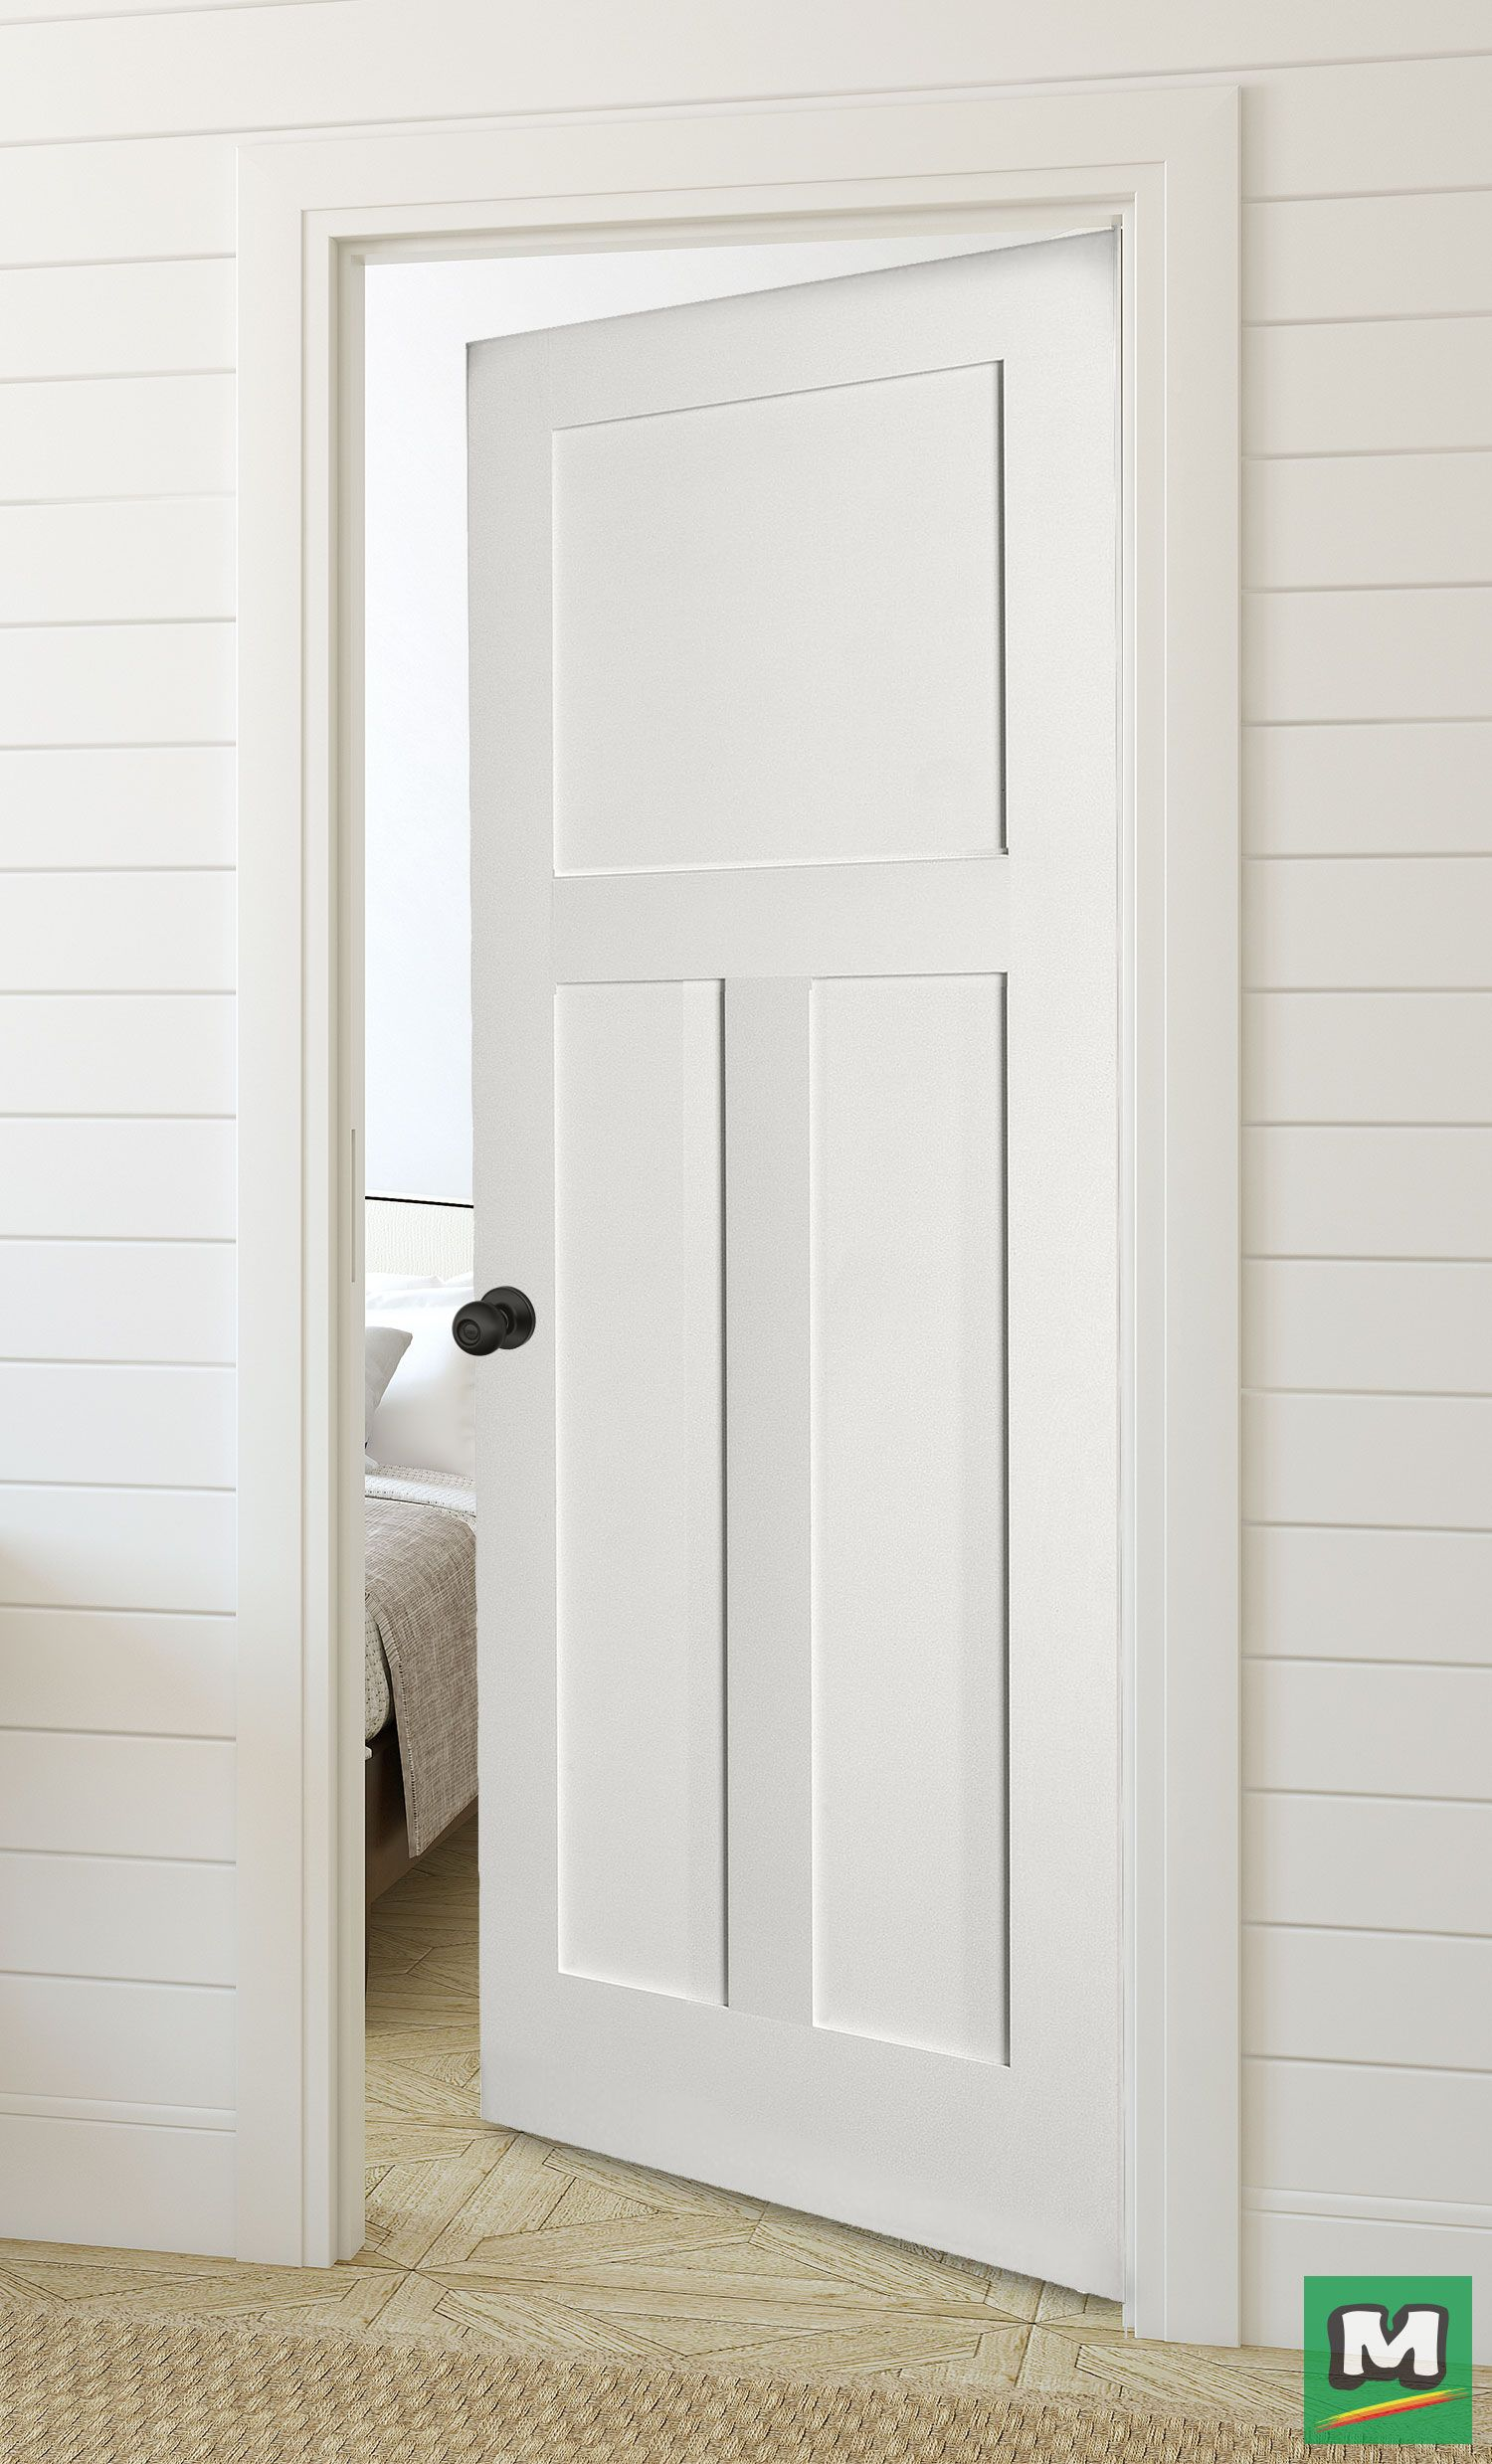 The Three Panel Door From Mastercraft Offers The Look Of A Handcrafted Door With A Design Tha Prehung Interior Doors White Interior Doors Black Interior Doors